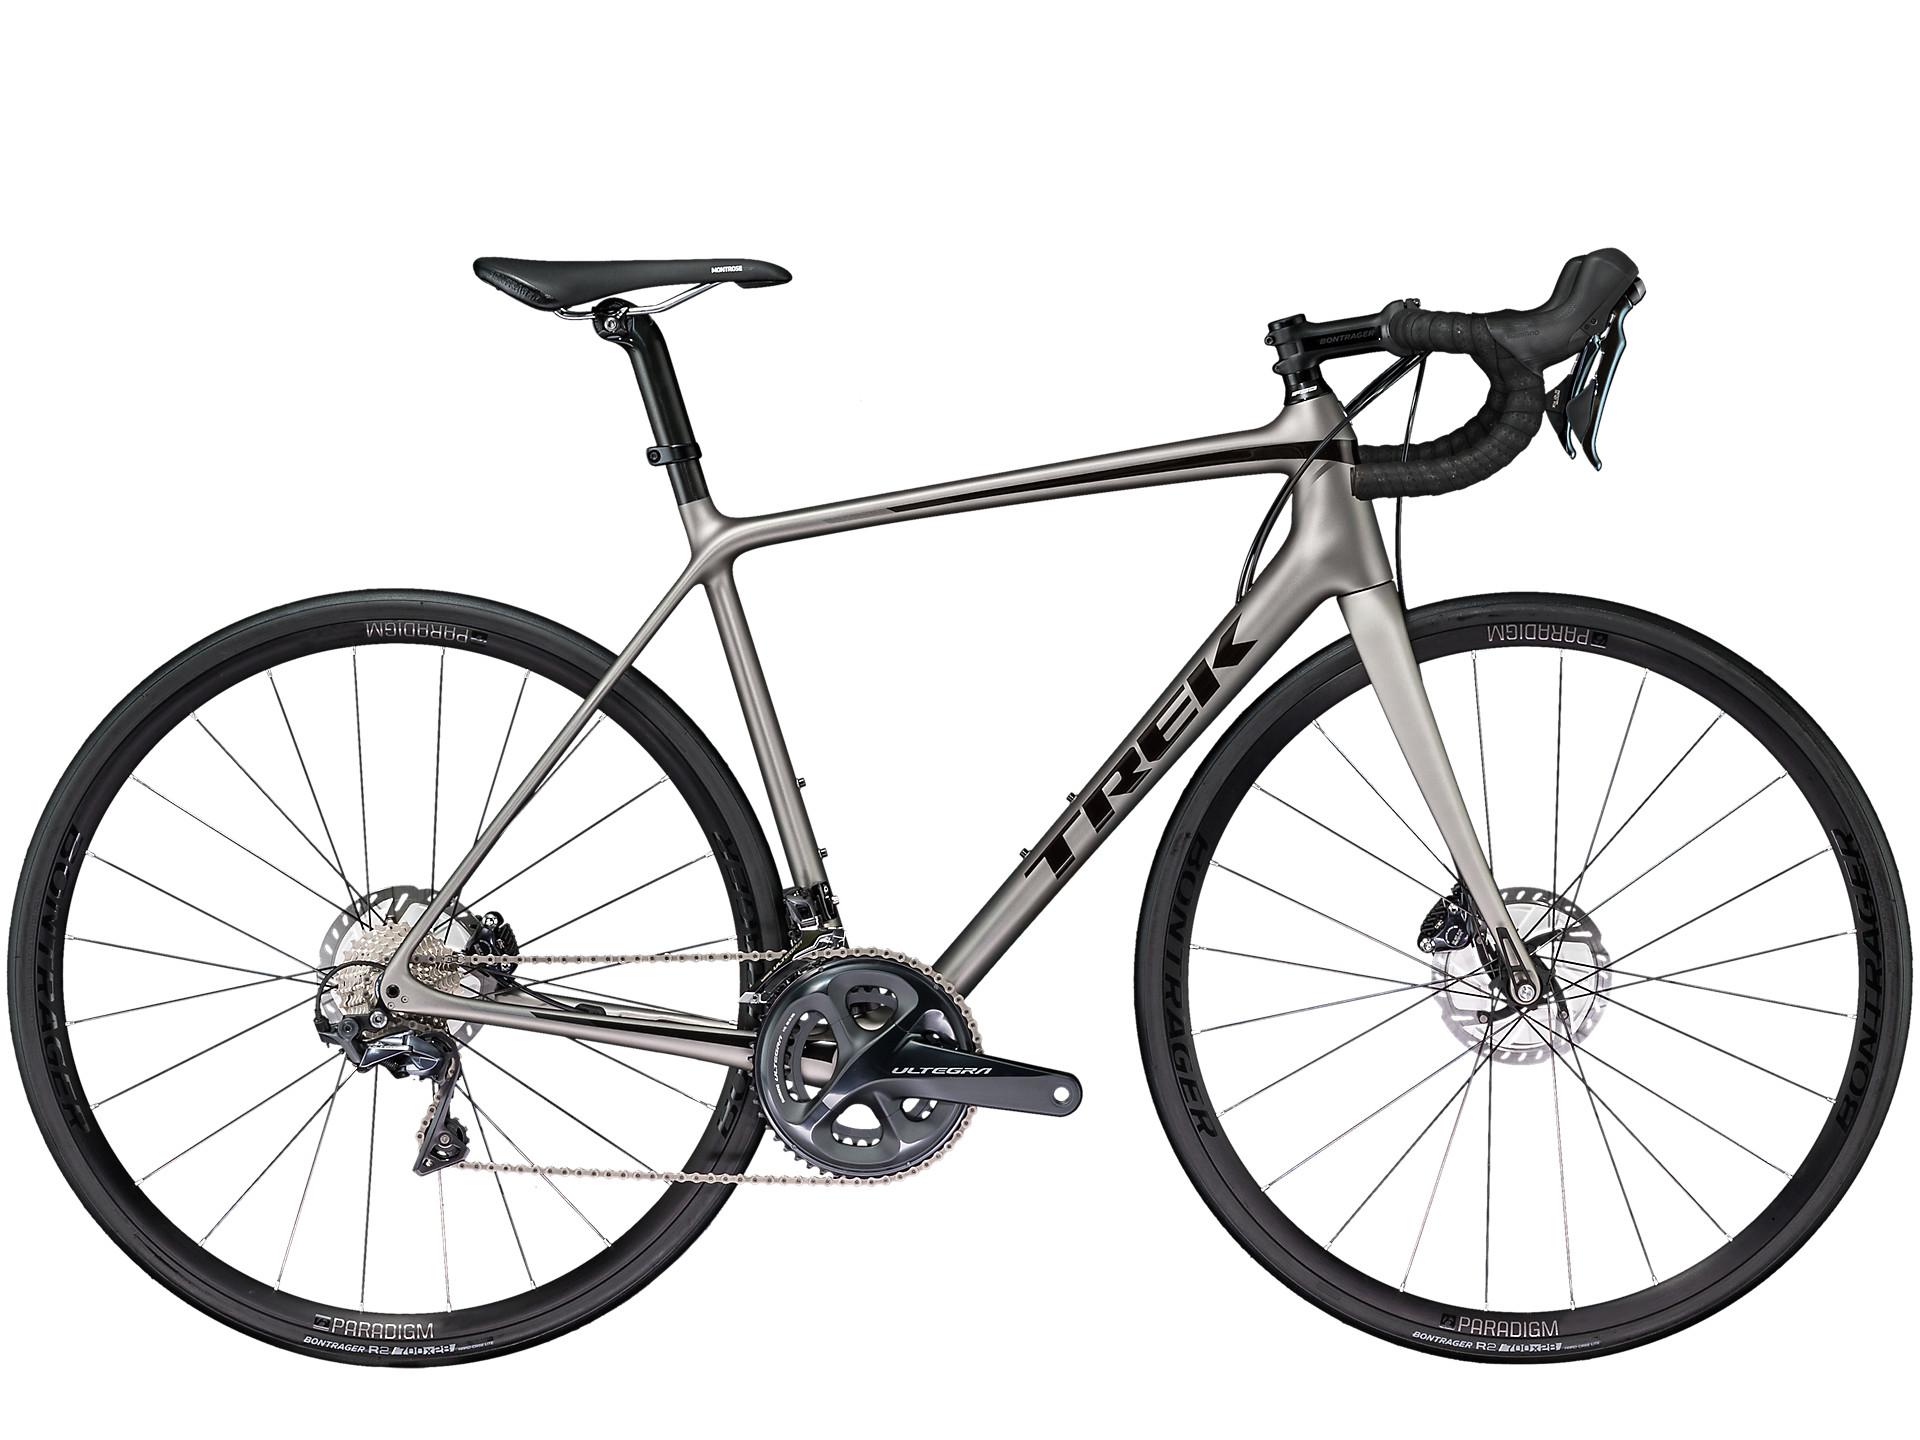 ad37a3d3619 Émonda SL 7 Disc | Trek Bikes (GB)